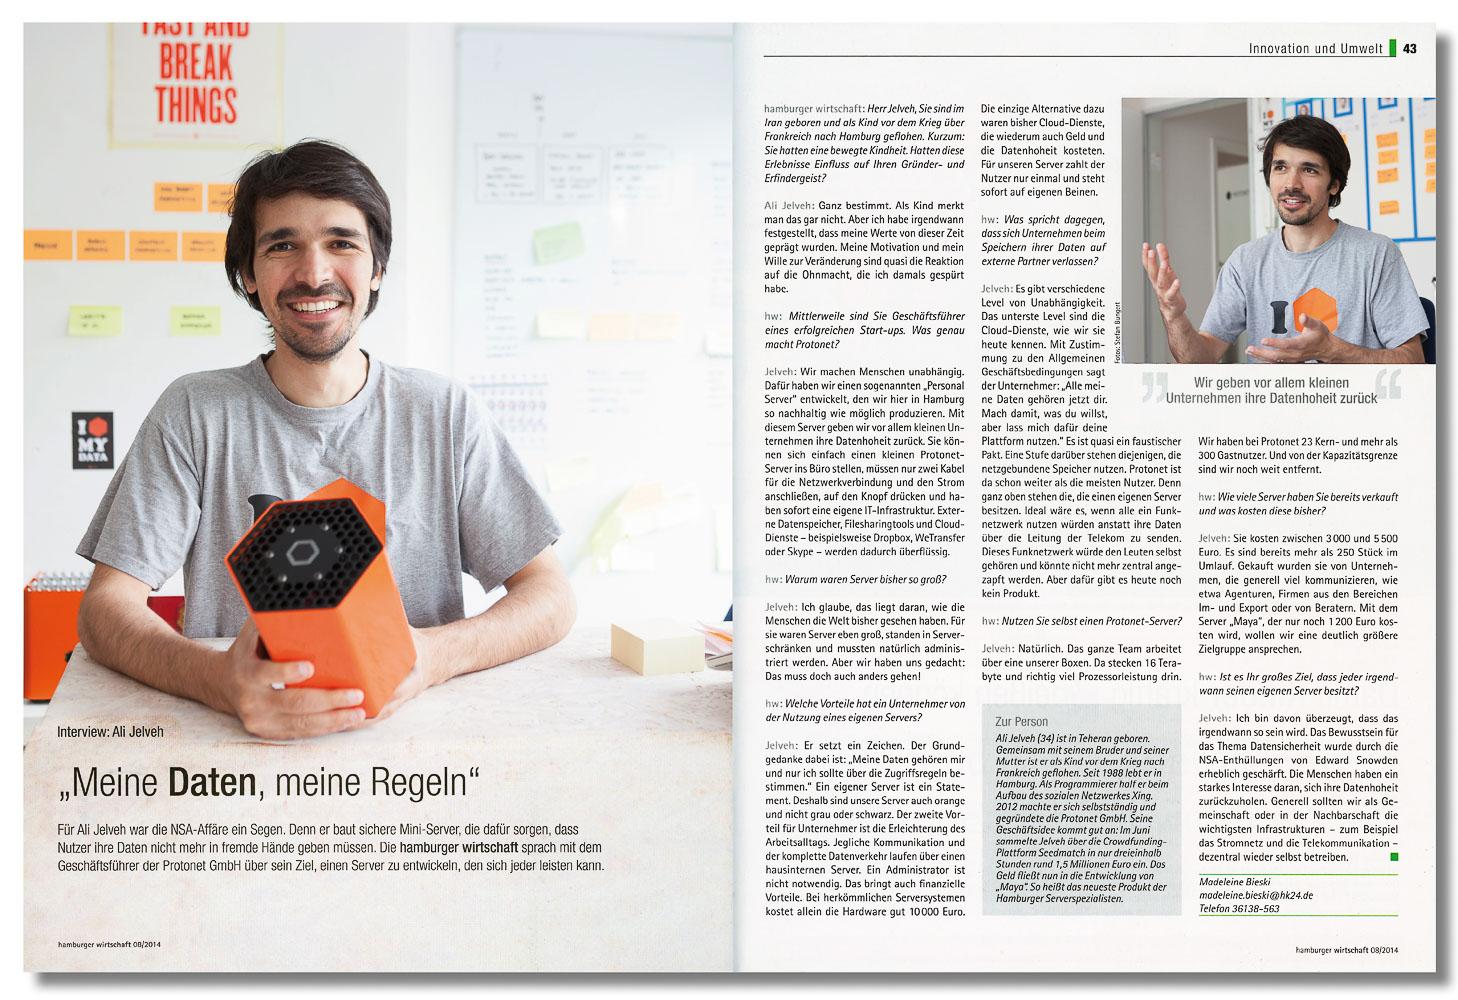 Ali Jelveh, Protonet, Hamburger Wirtschaft